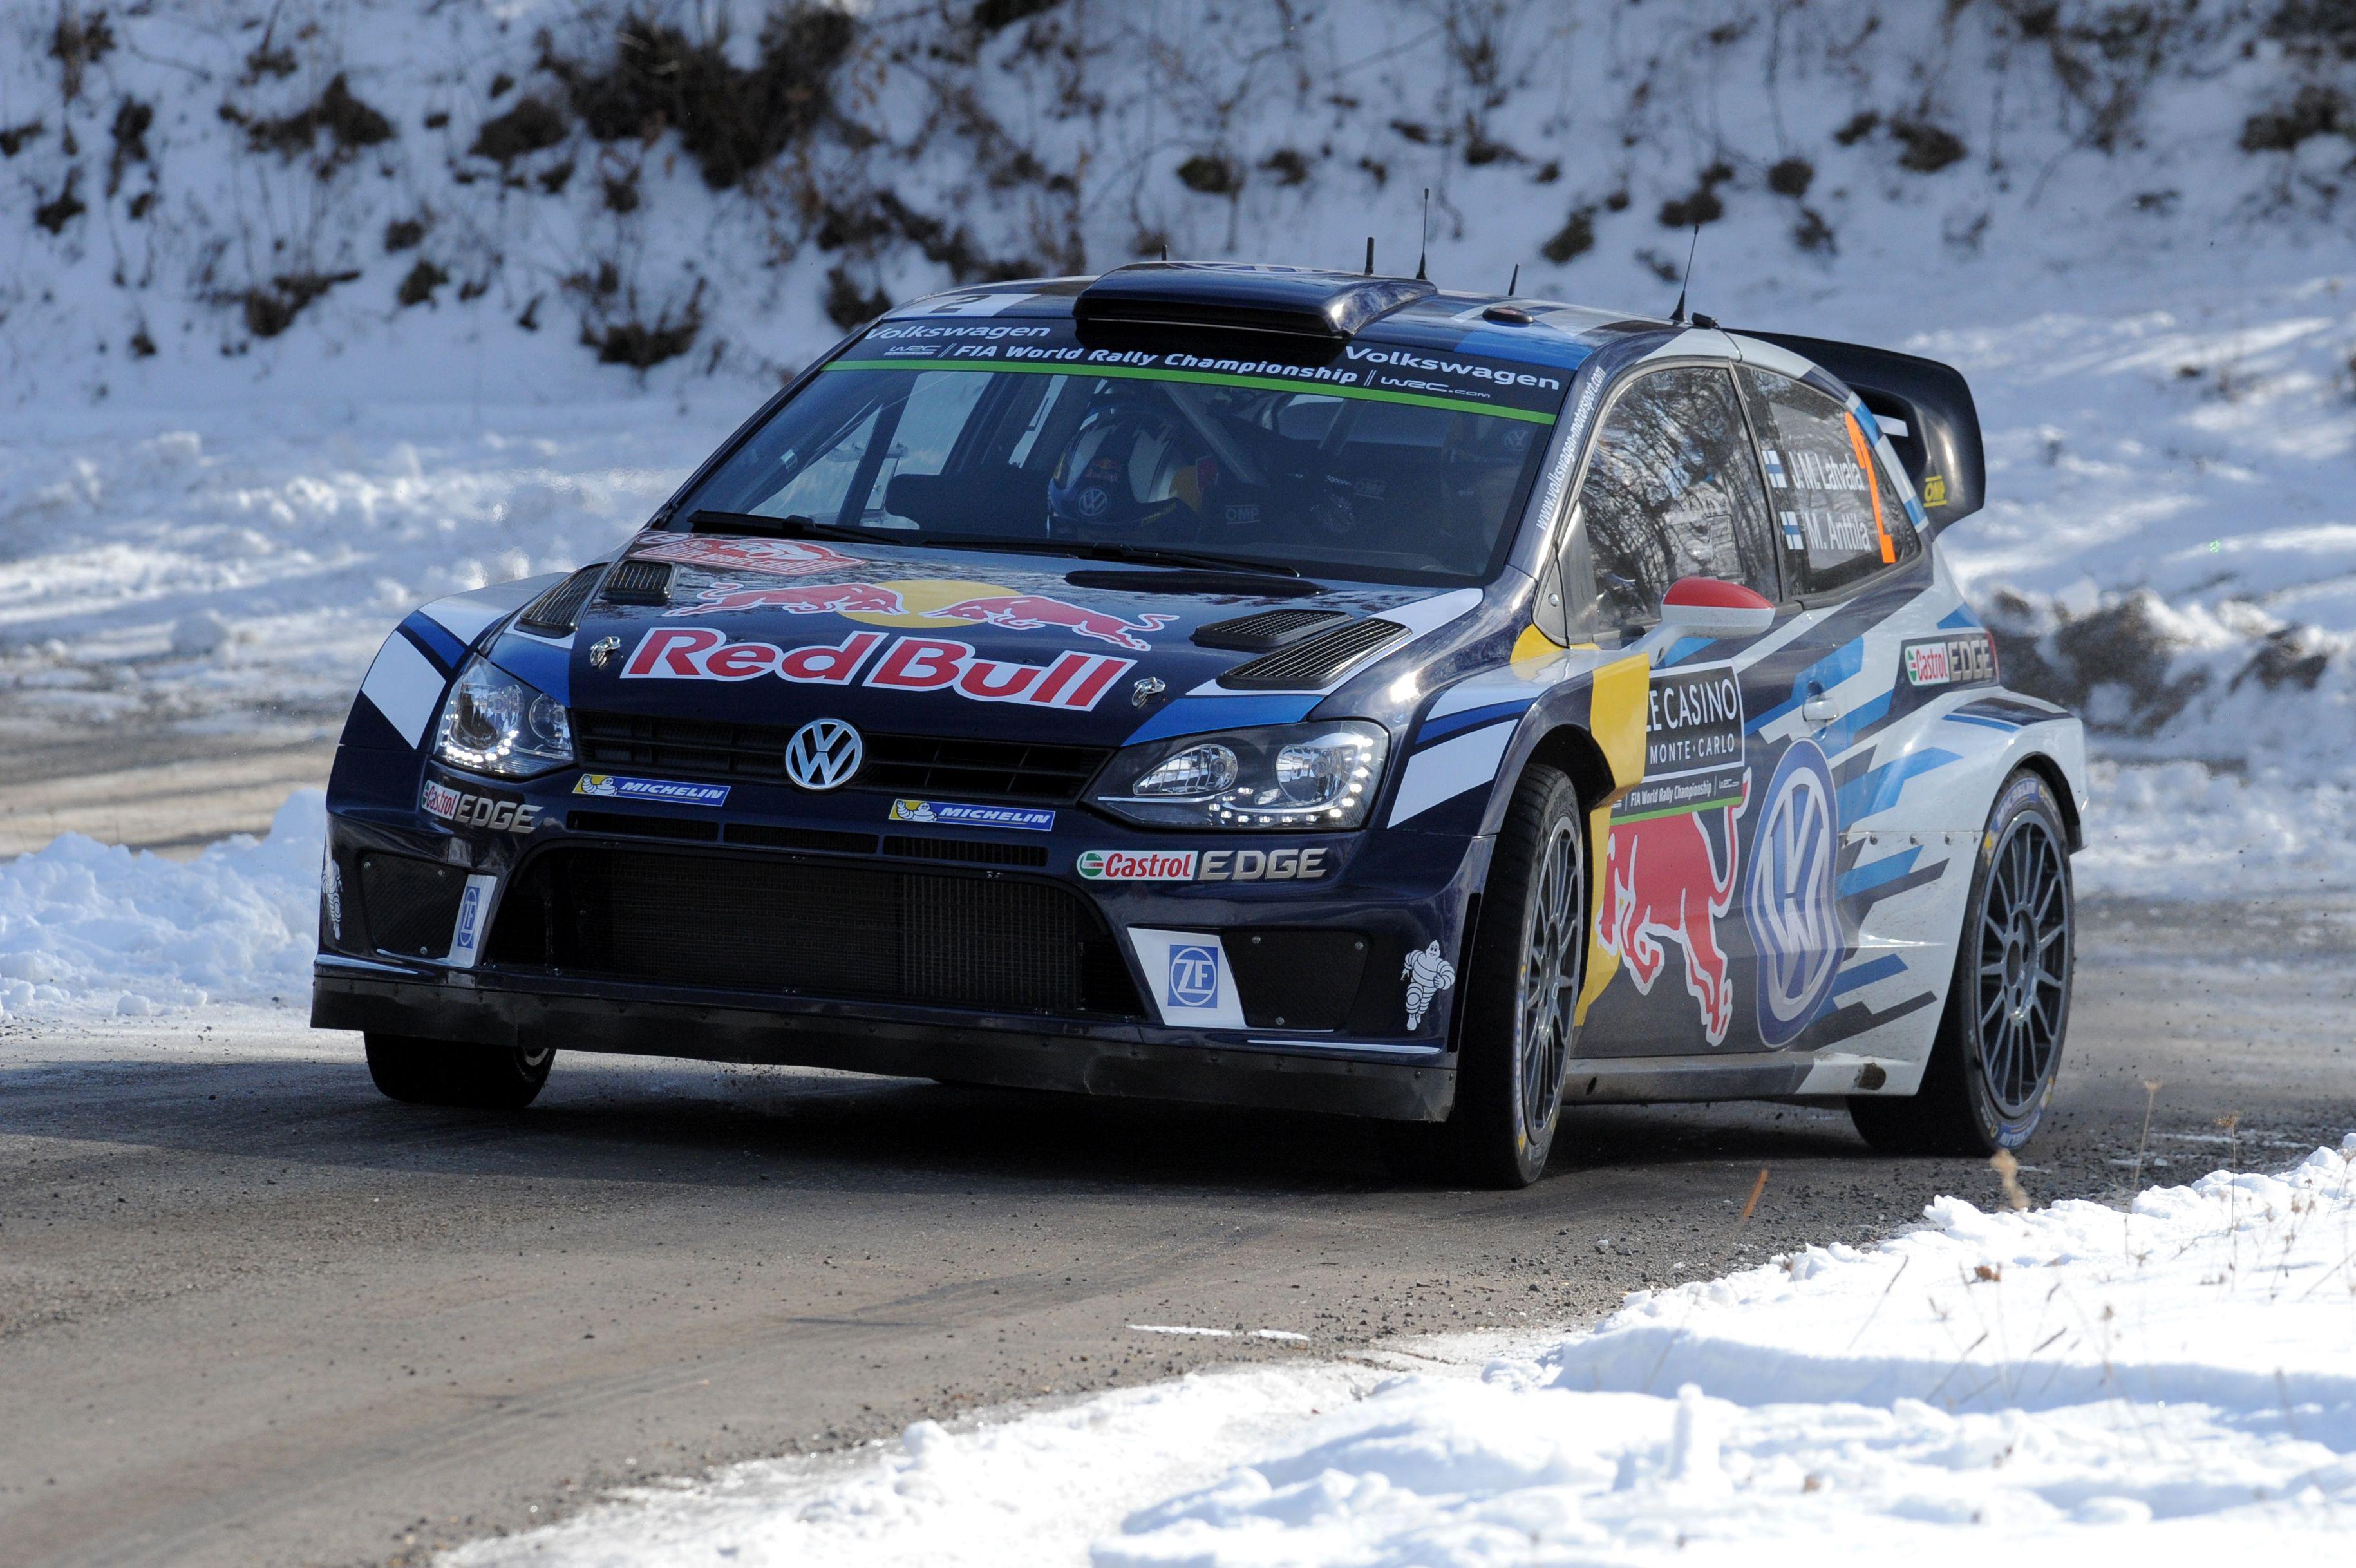 Rallye - Latvala suspendu apr�s avoir renvers� un spectateur